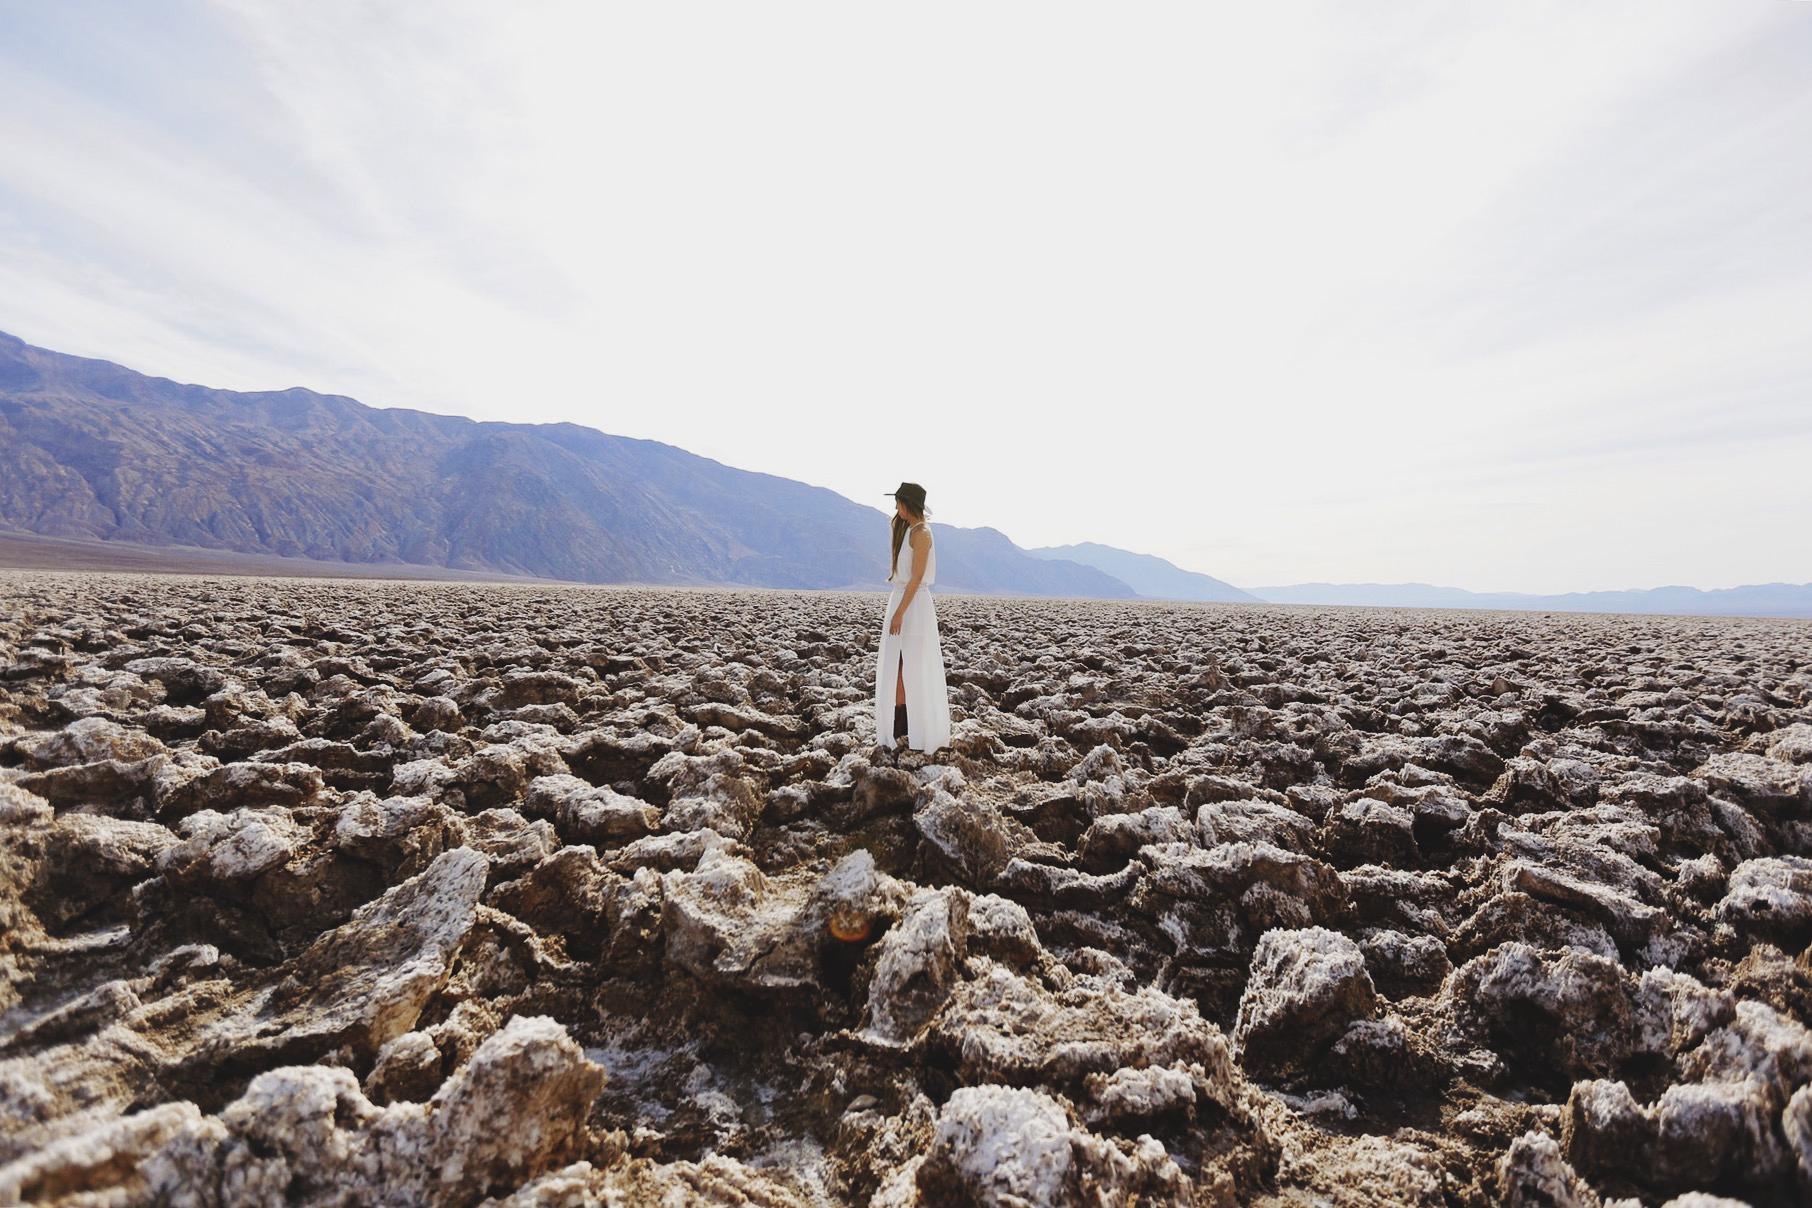 Death Valley 2015 (48 of 82).JPG